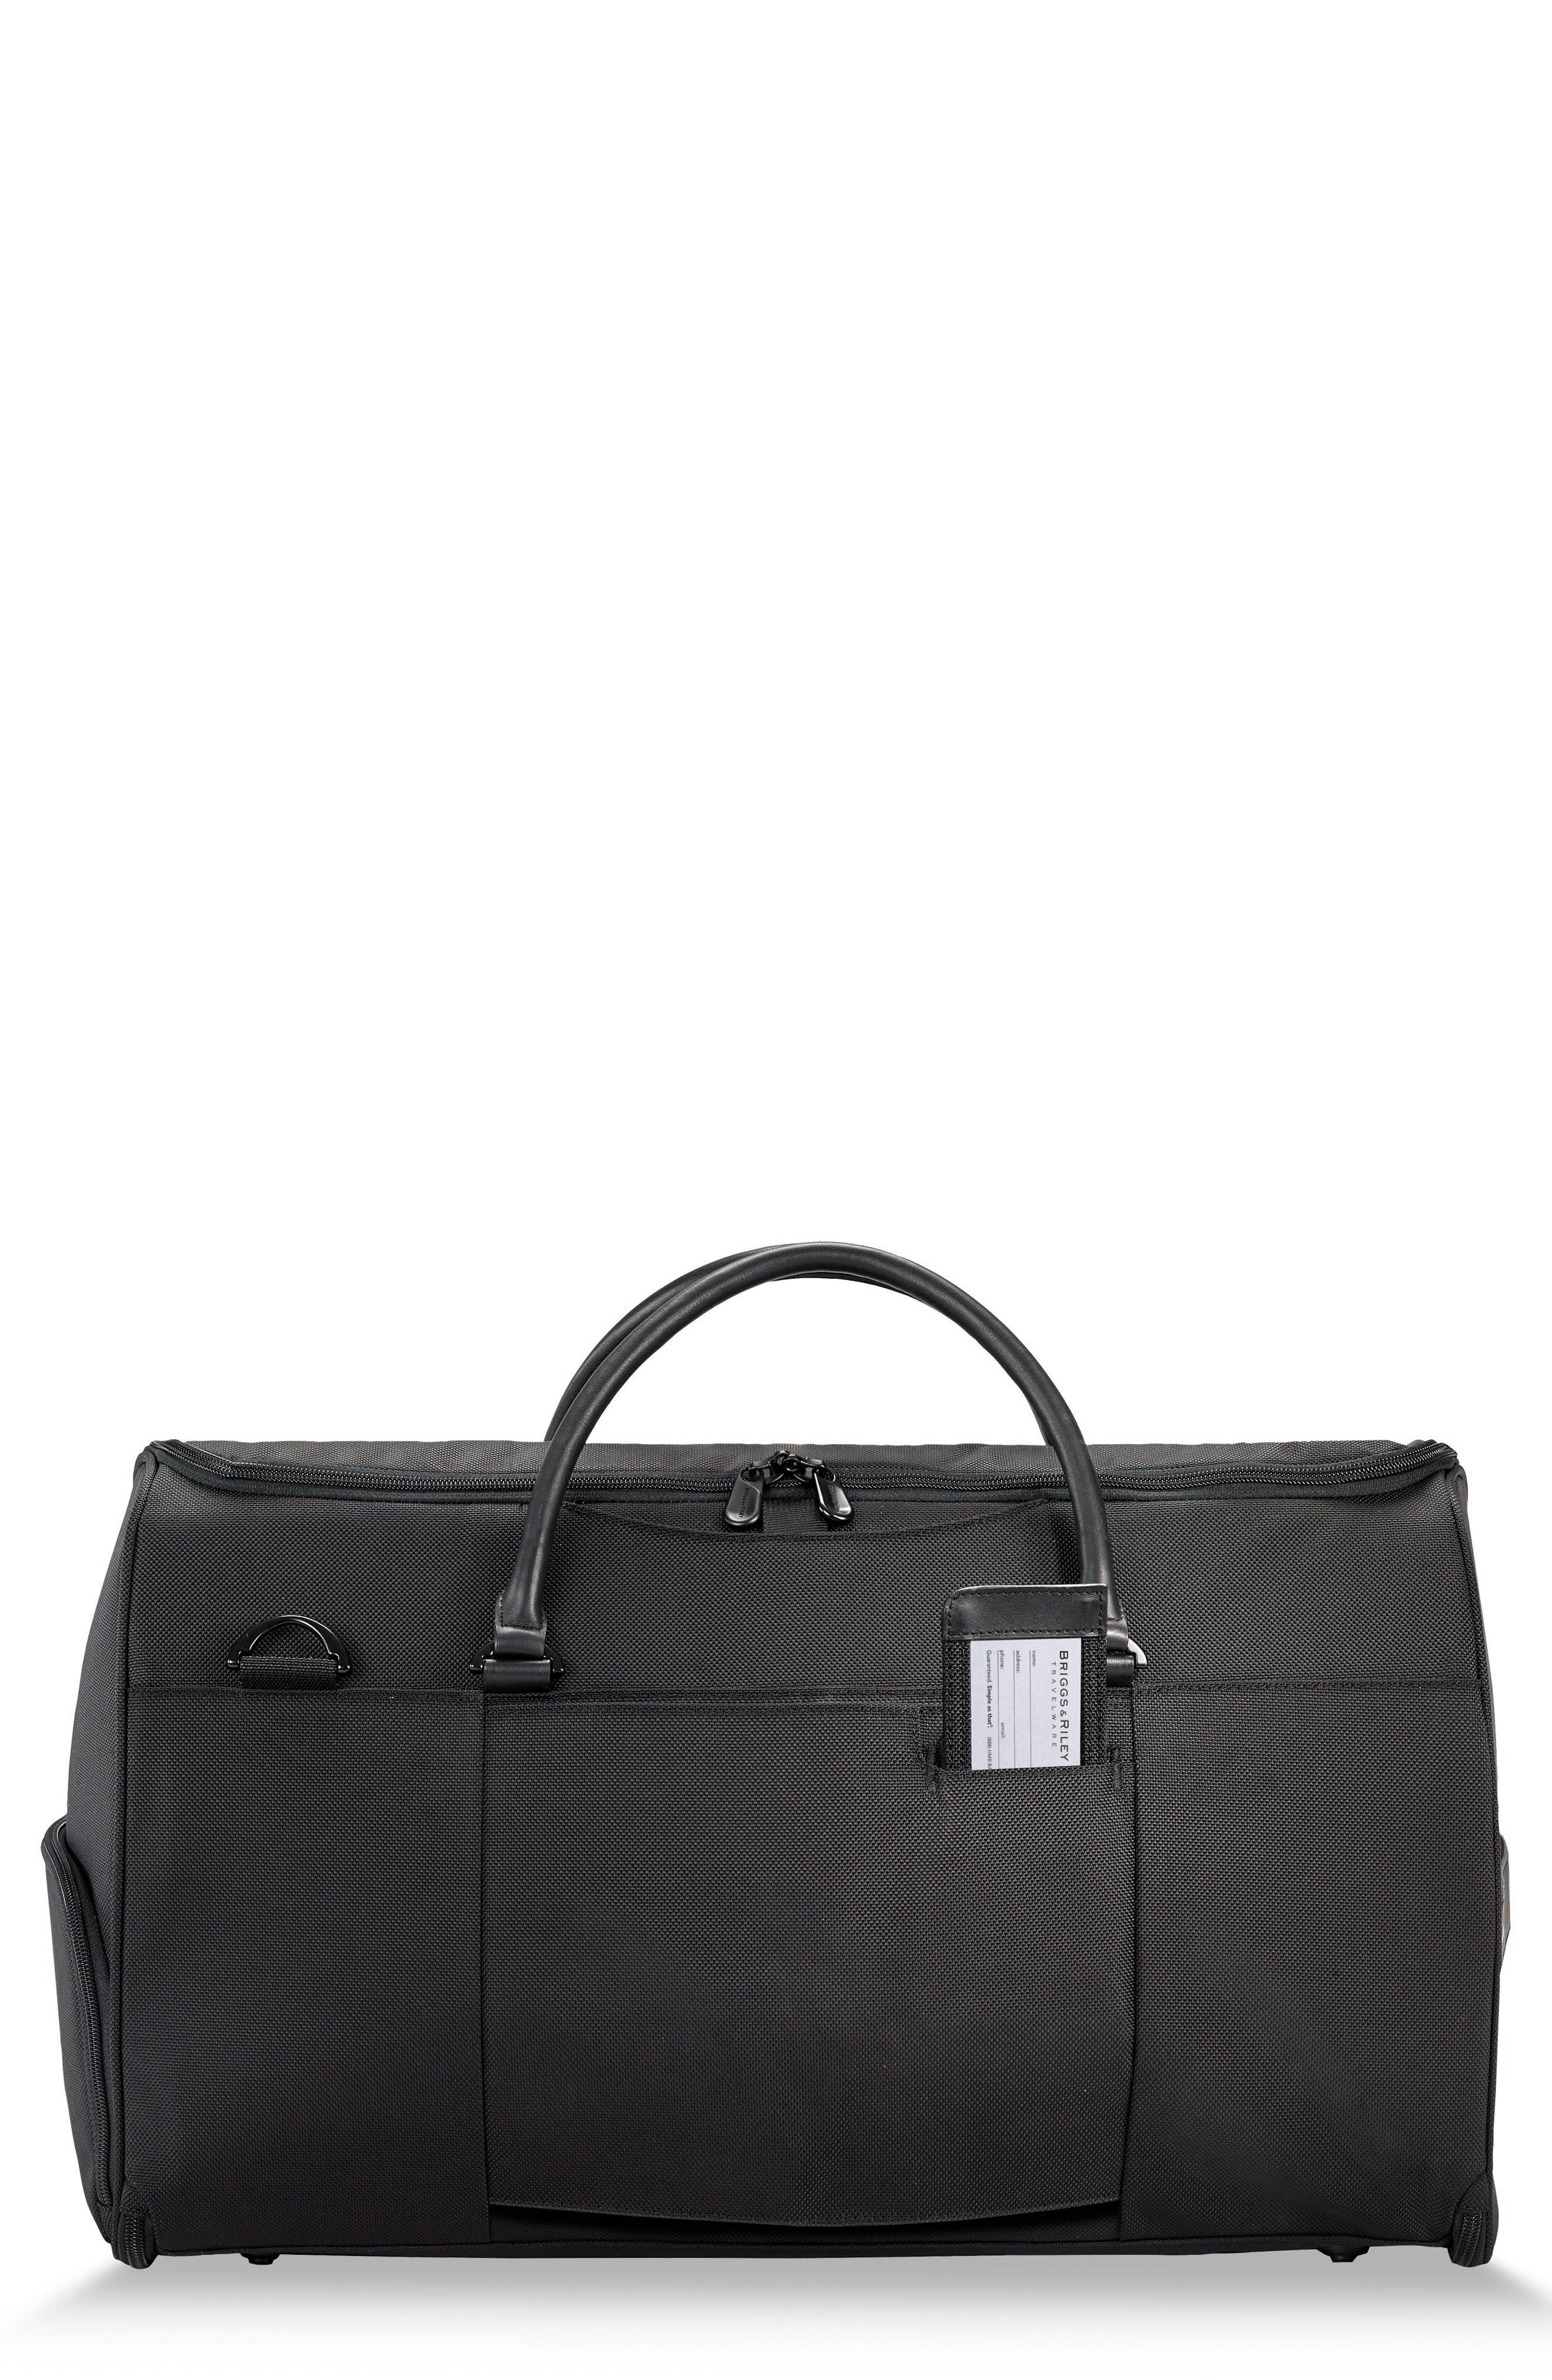 BRIGGS & RILEY Baseline Suiter Duffel Bag, Main, color, BLACK